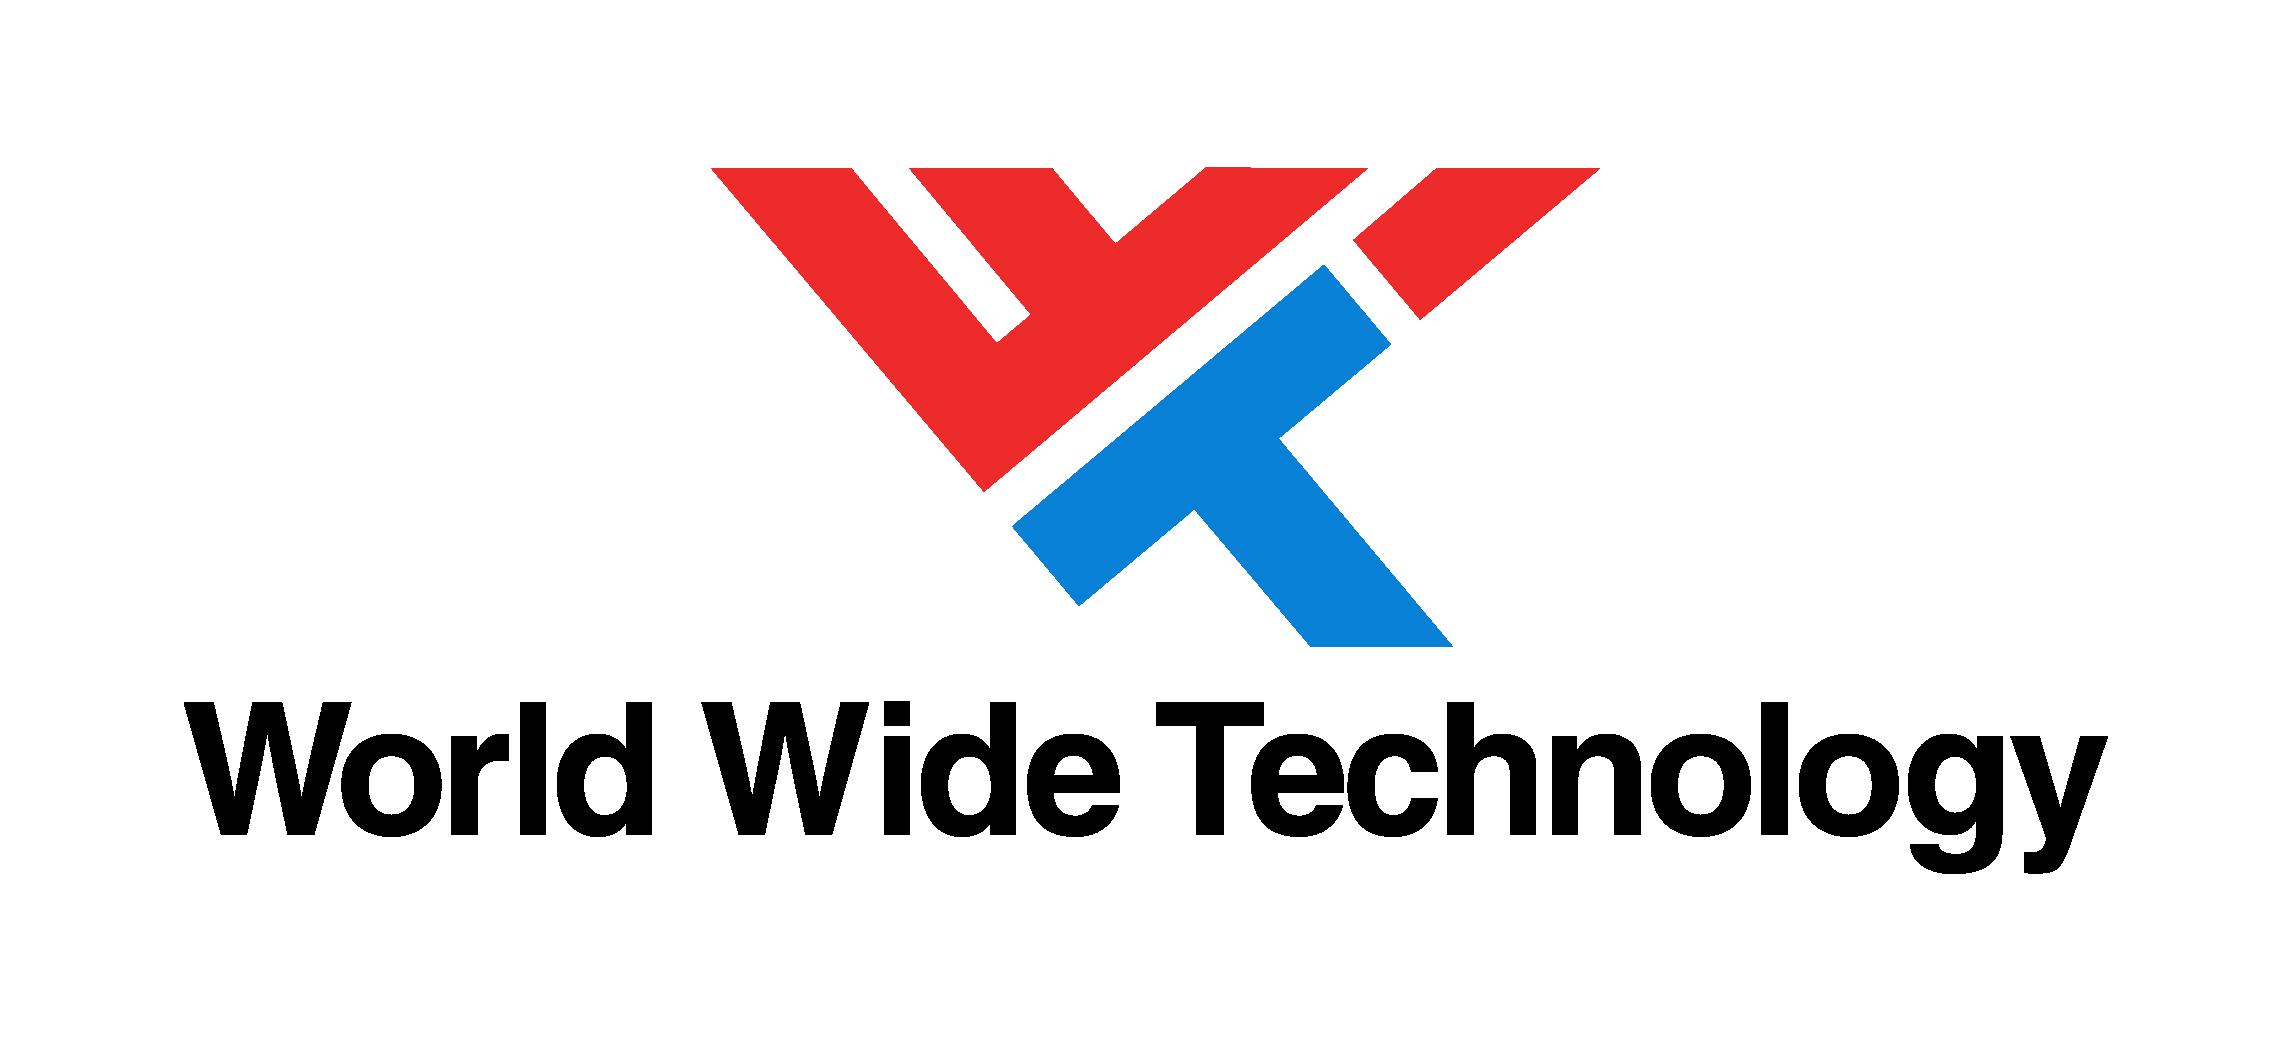 World Wide Technology_2017